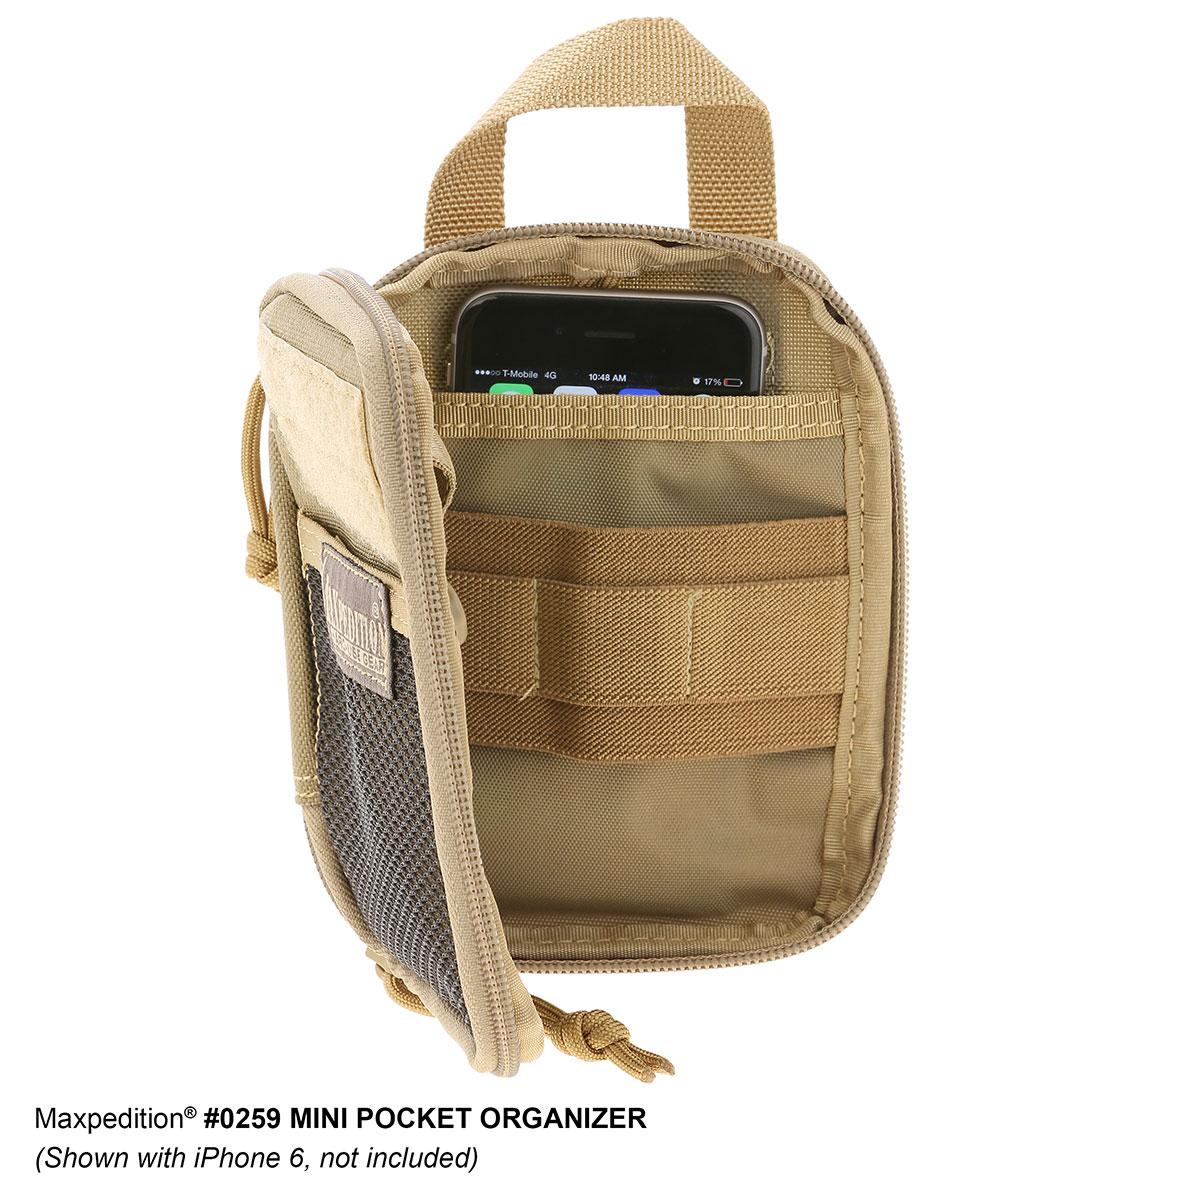 lowest price a1262 646db Maxpedition Mini Pocket Organizer